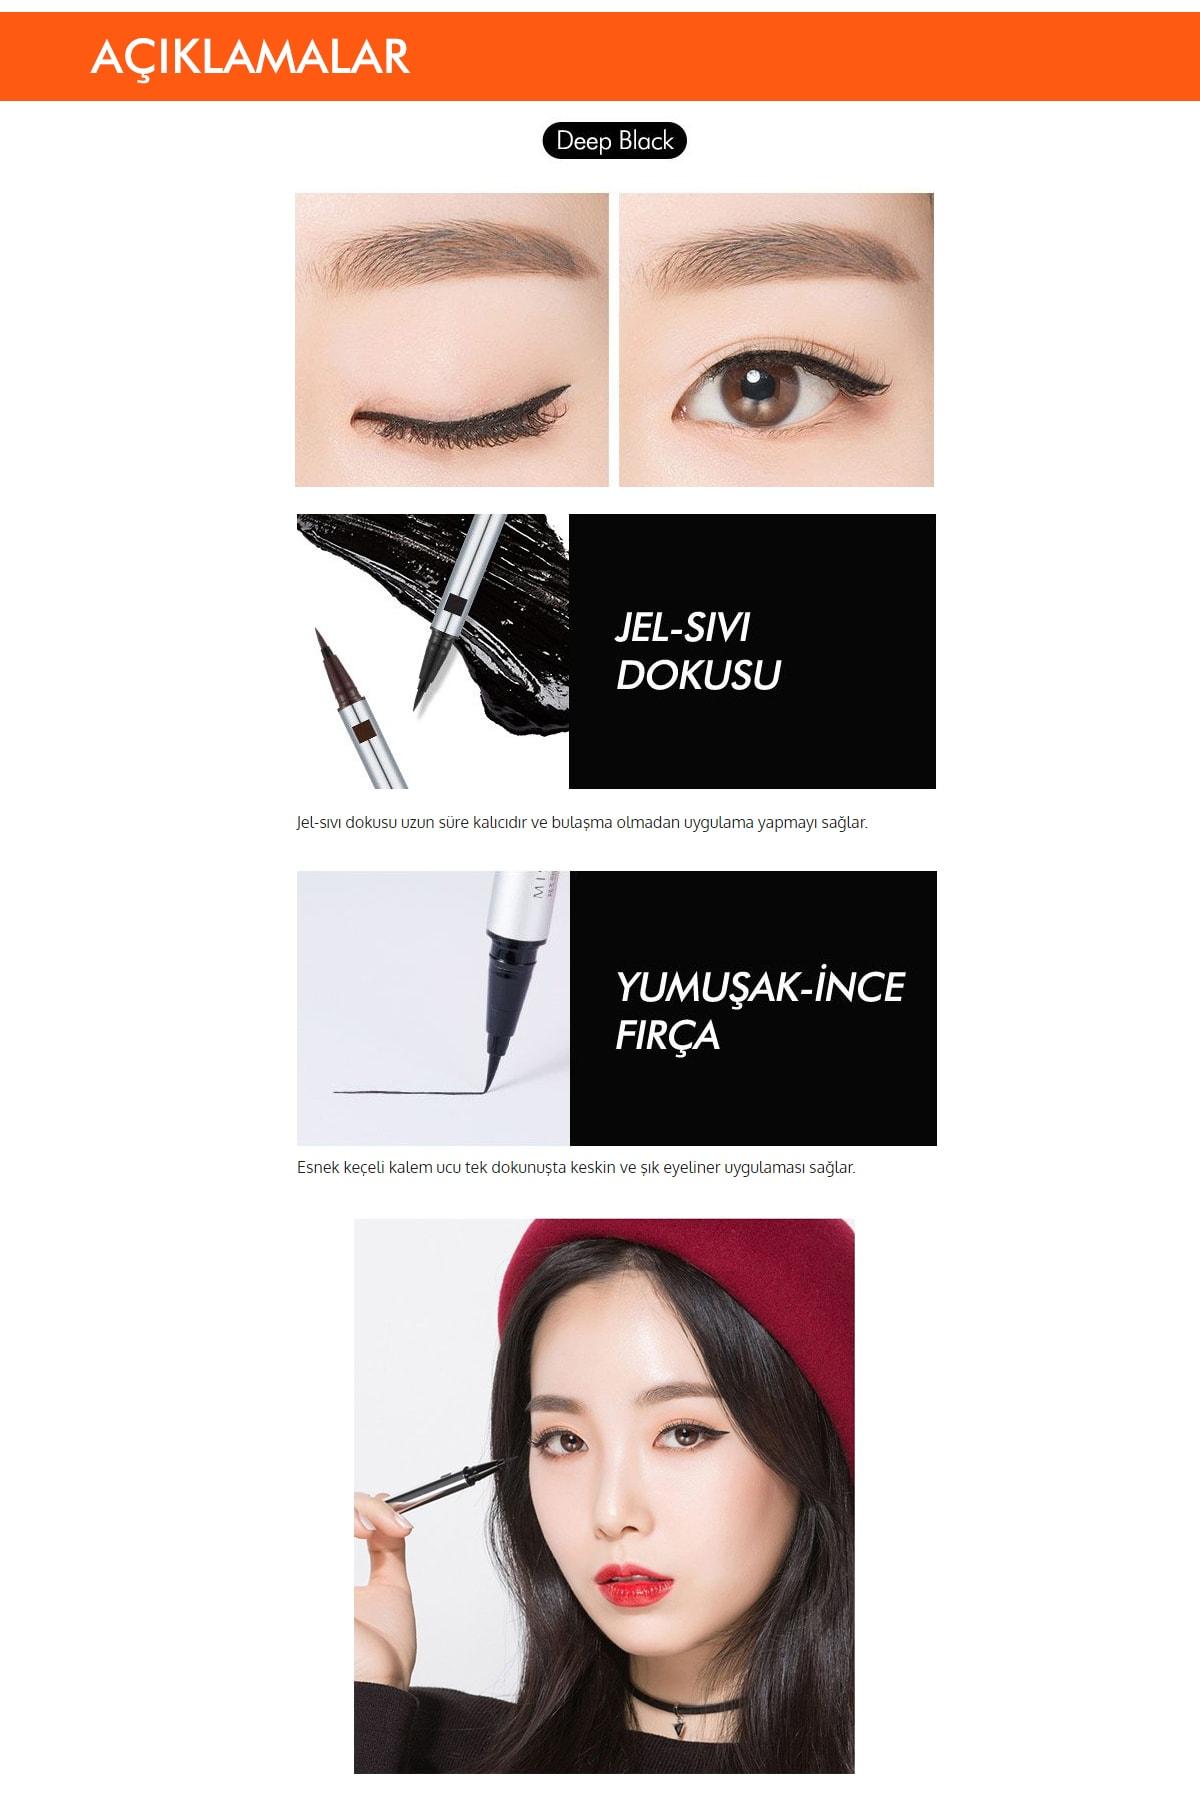 Missha Kalıcı & Kadife Uçlu Eyeliner Vivid Fix Marker Pen Liner (Deep Black) 1